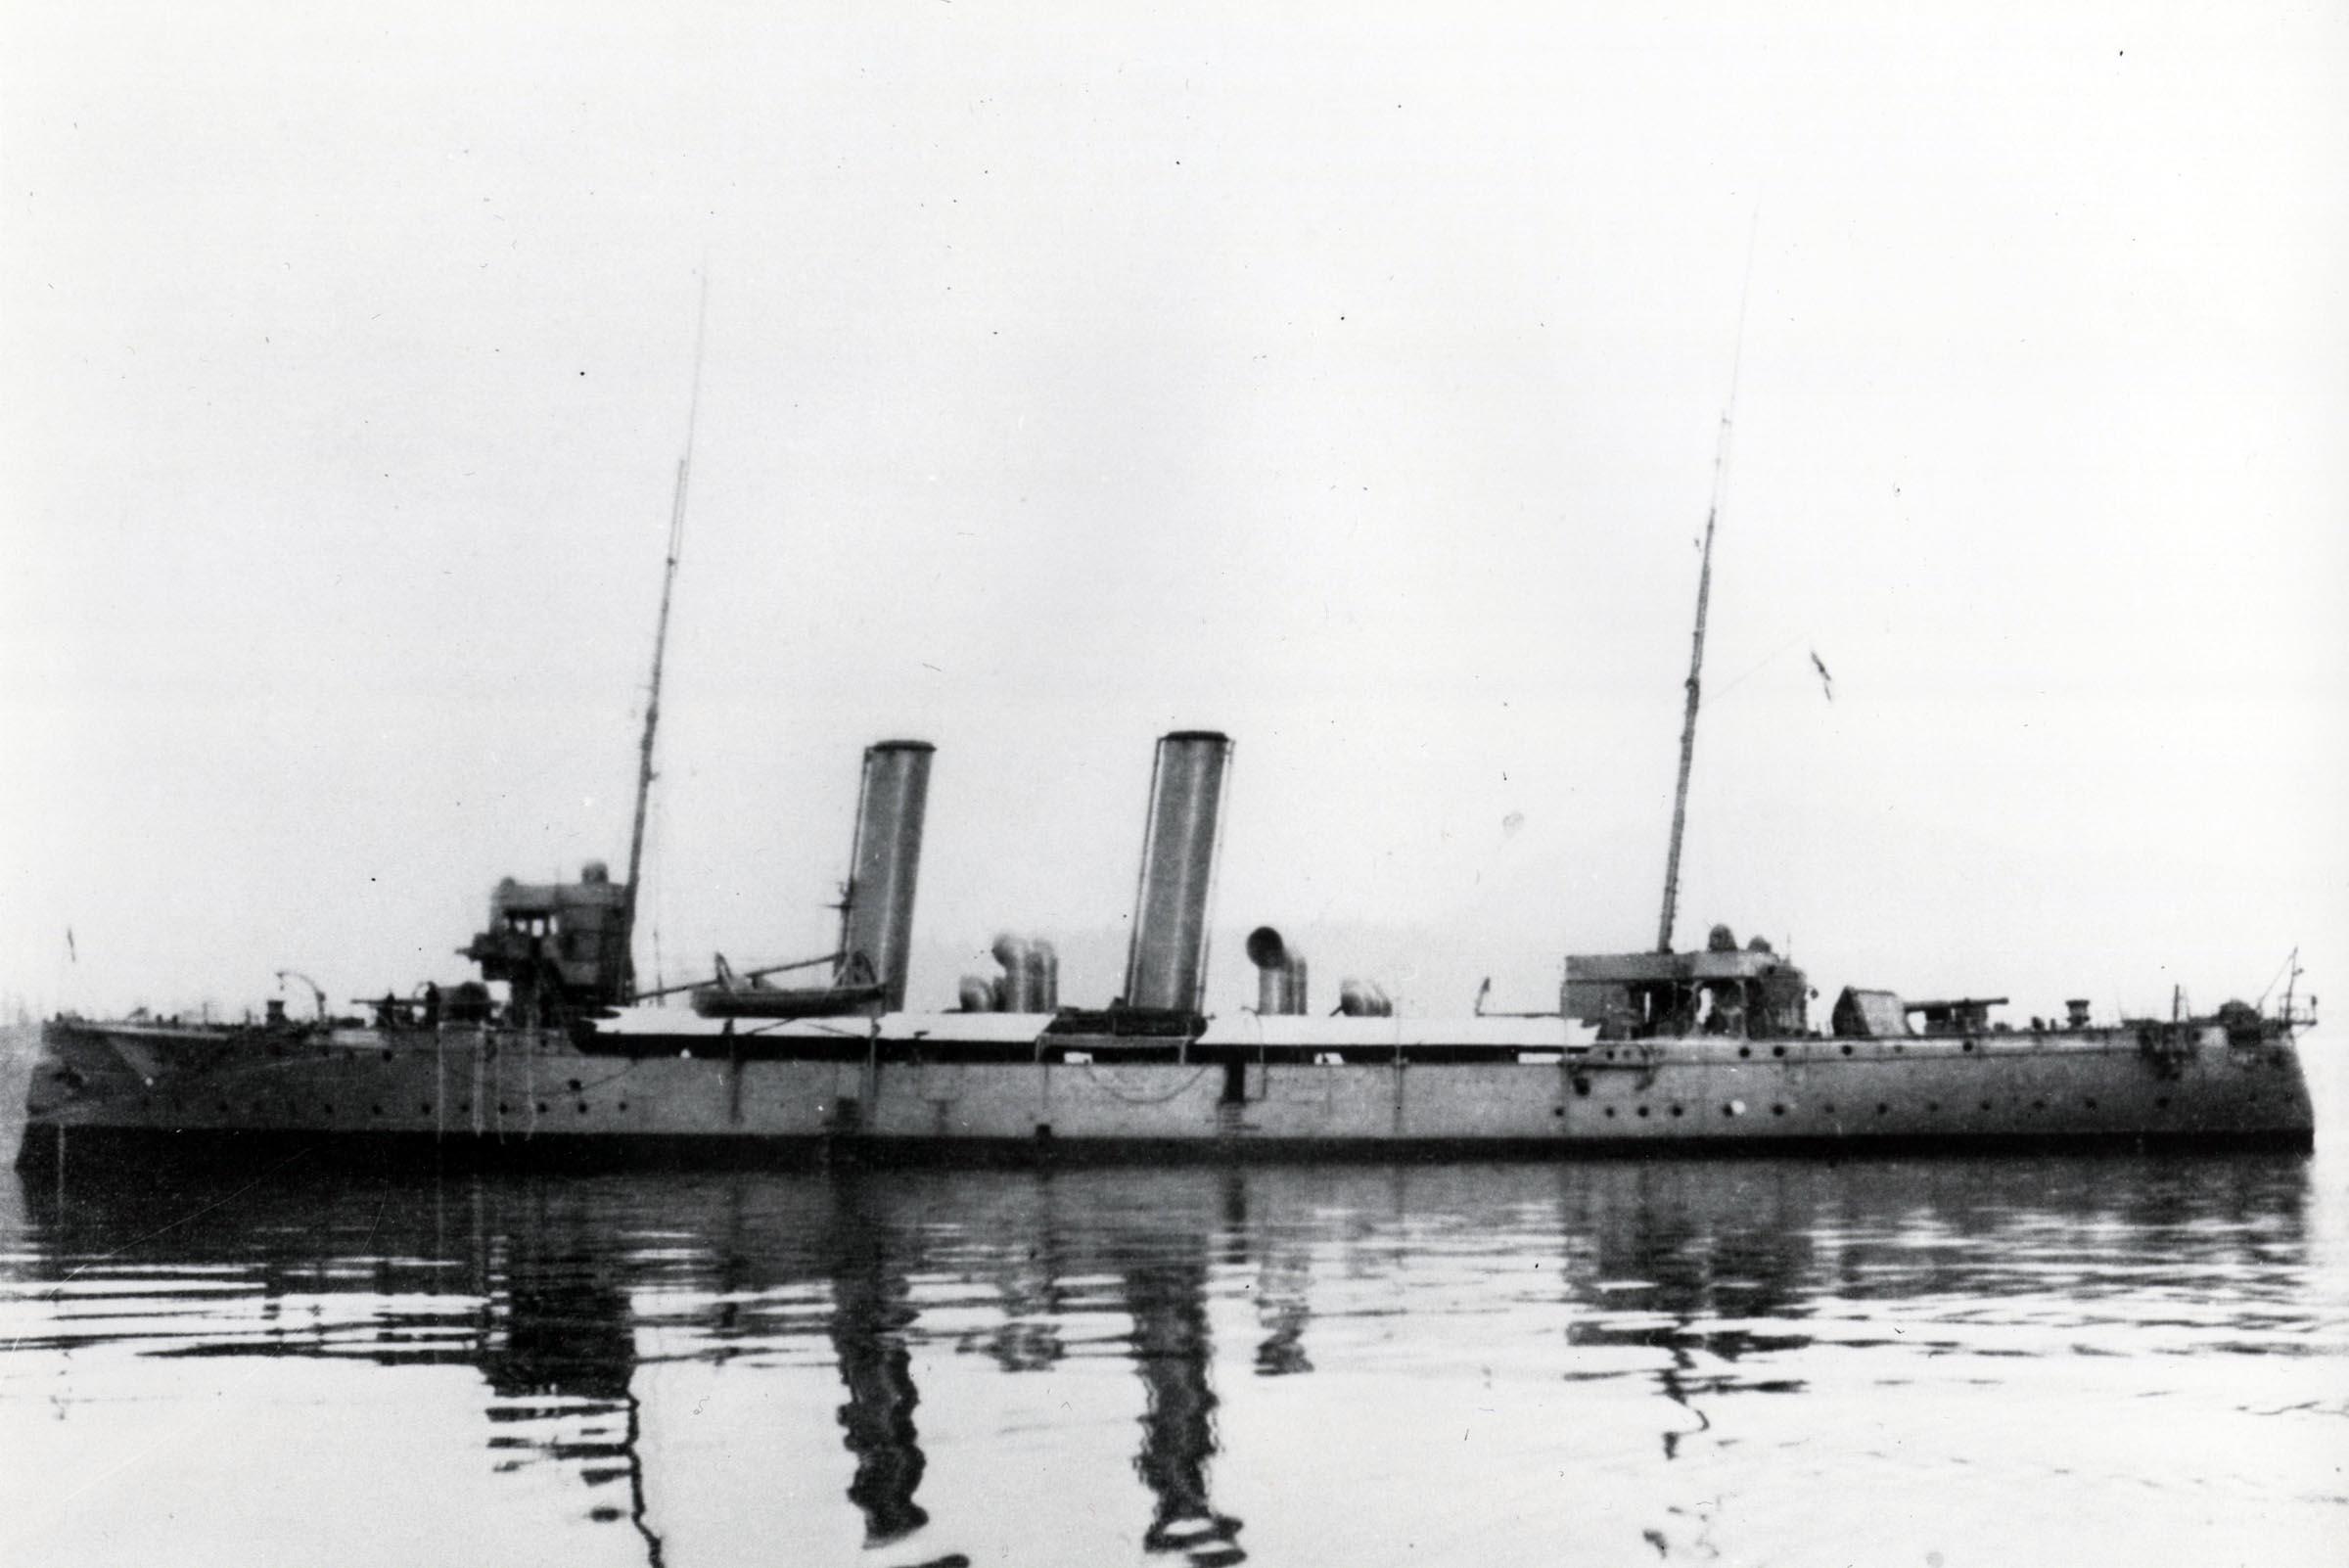 HMCS RAINBOW (1st)